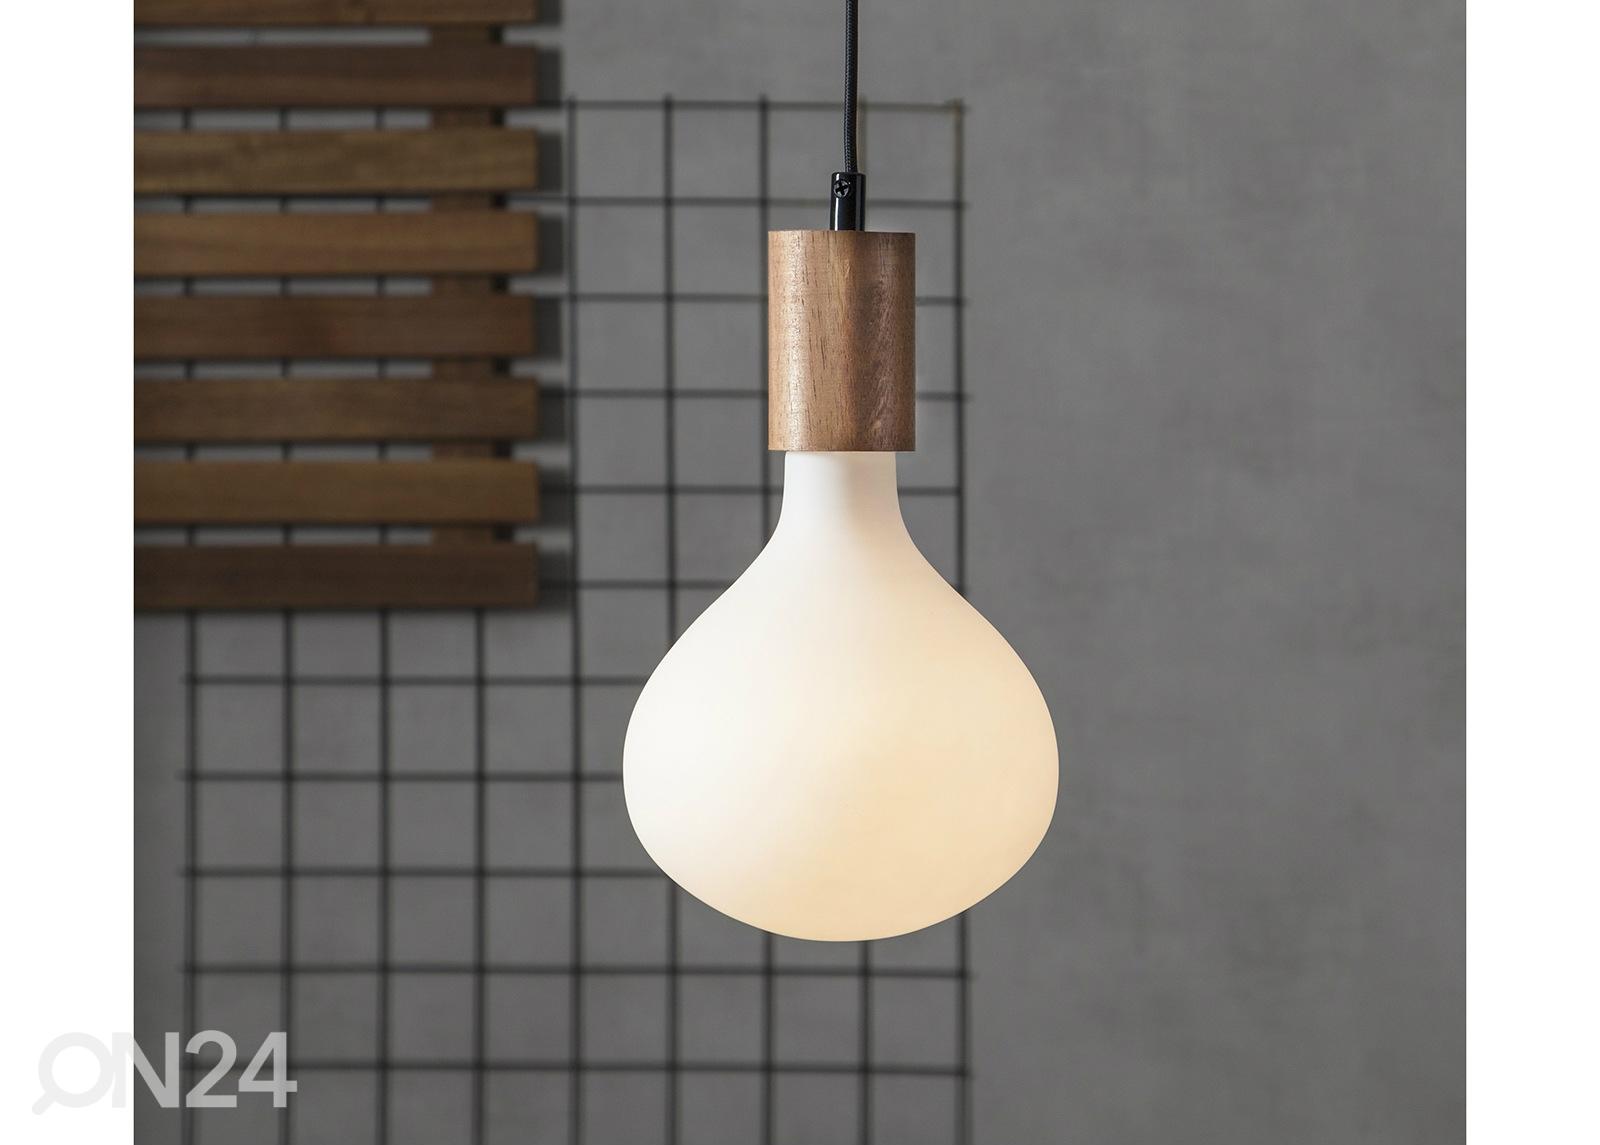 e93c865eab7 Dekoratiivne LED pirn E27 5,6 W AA-152766 - ON24 Sisustuskaubamaja